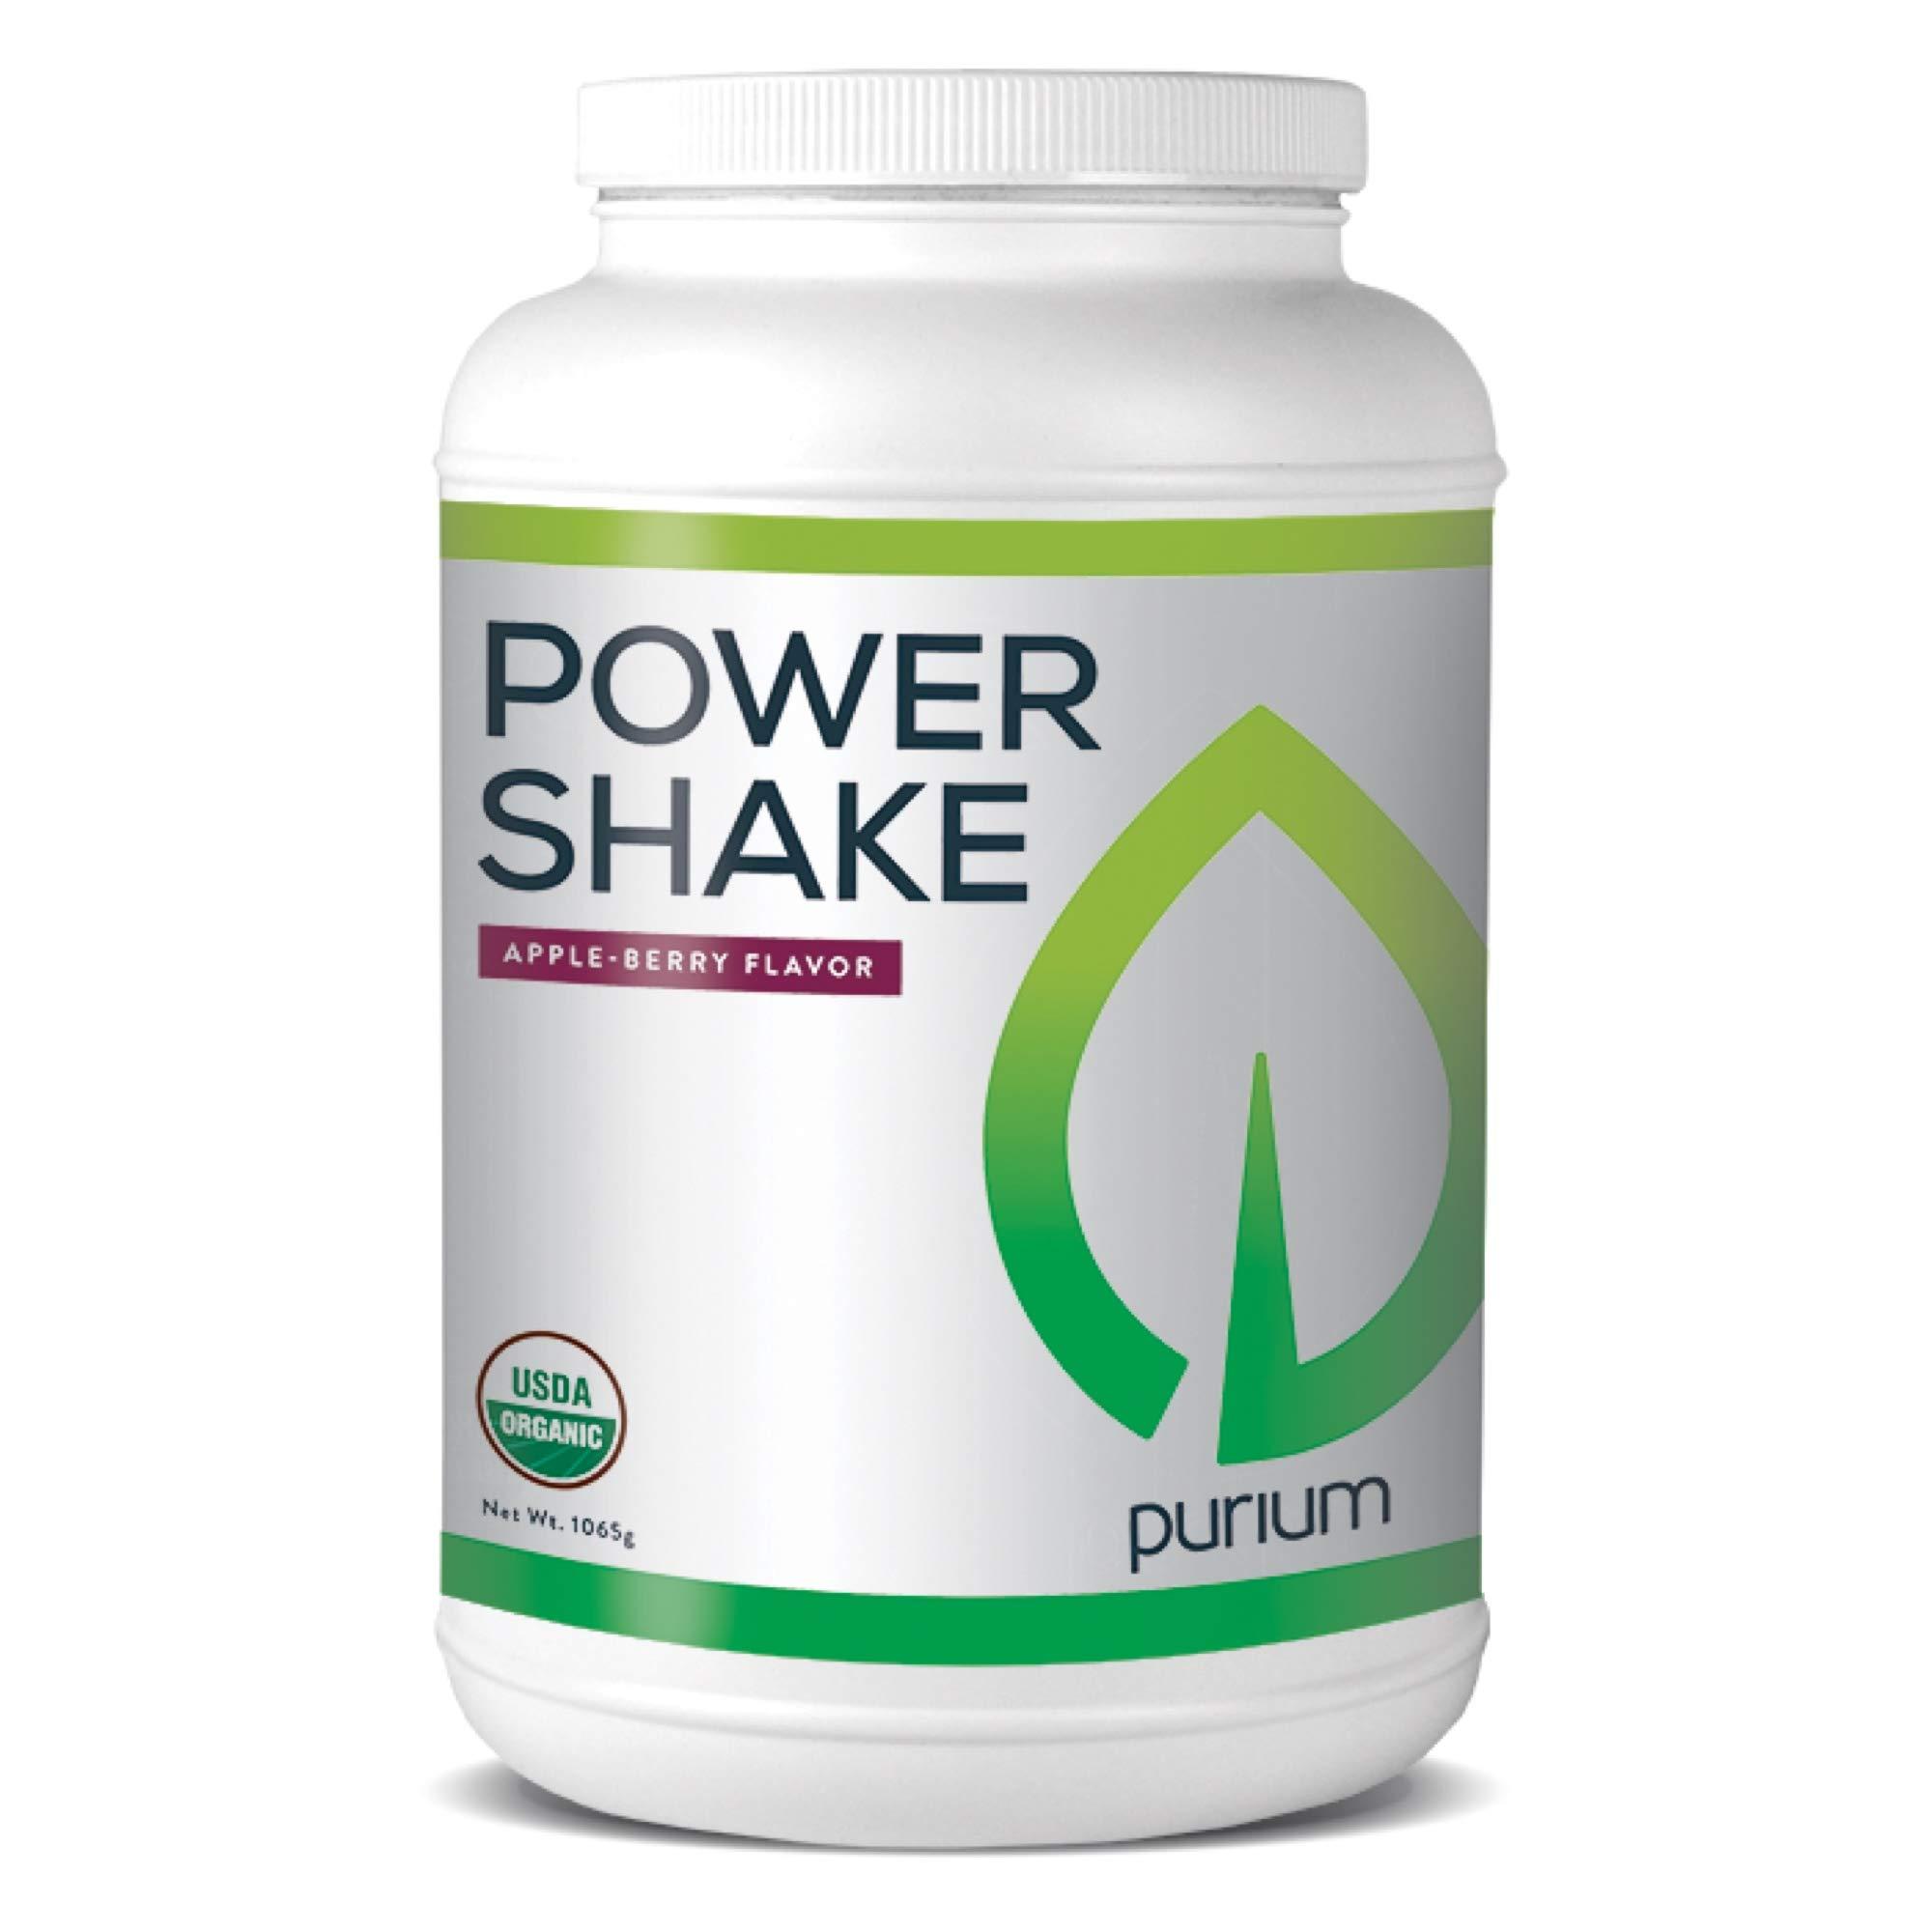 Purium Power Shake - Apple Berry Flavor - 1065 grams - Vegan Meal Replacement Powder, Protein, Vitamins & Minerals - Certified USDA Organic, Gluten Free, Kosher - 30 Servings by Purium